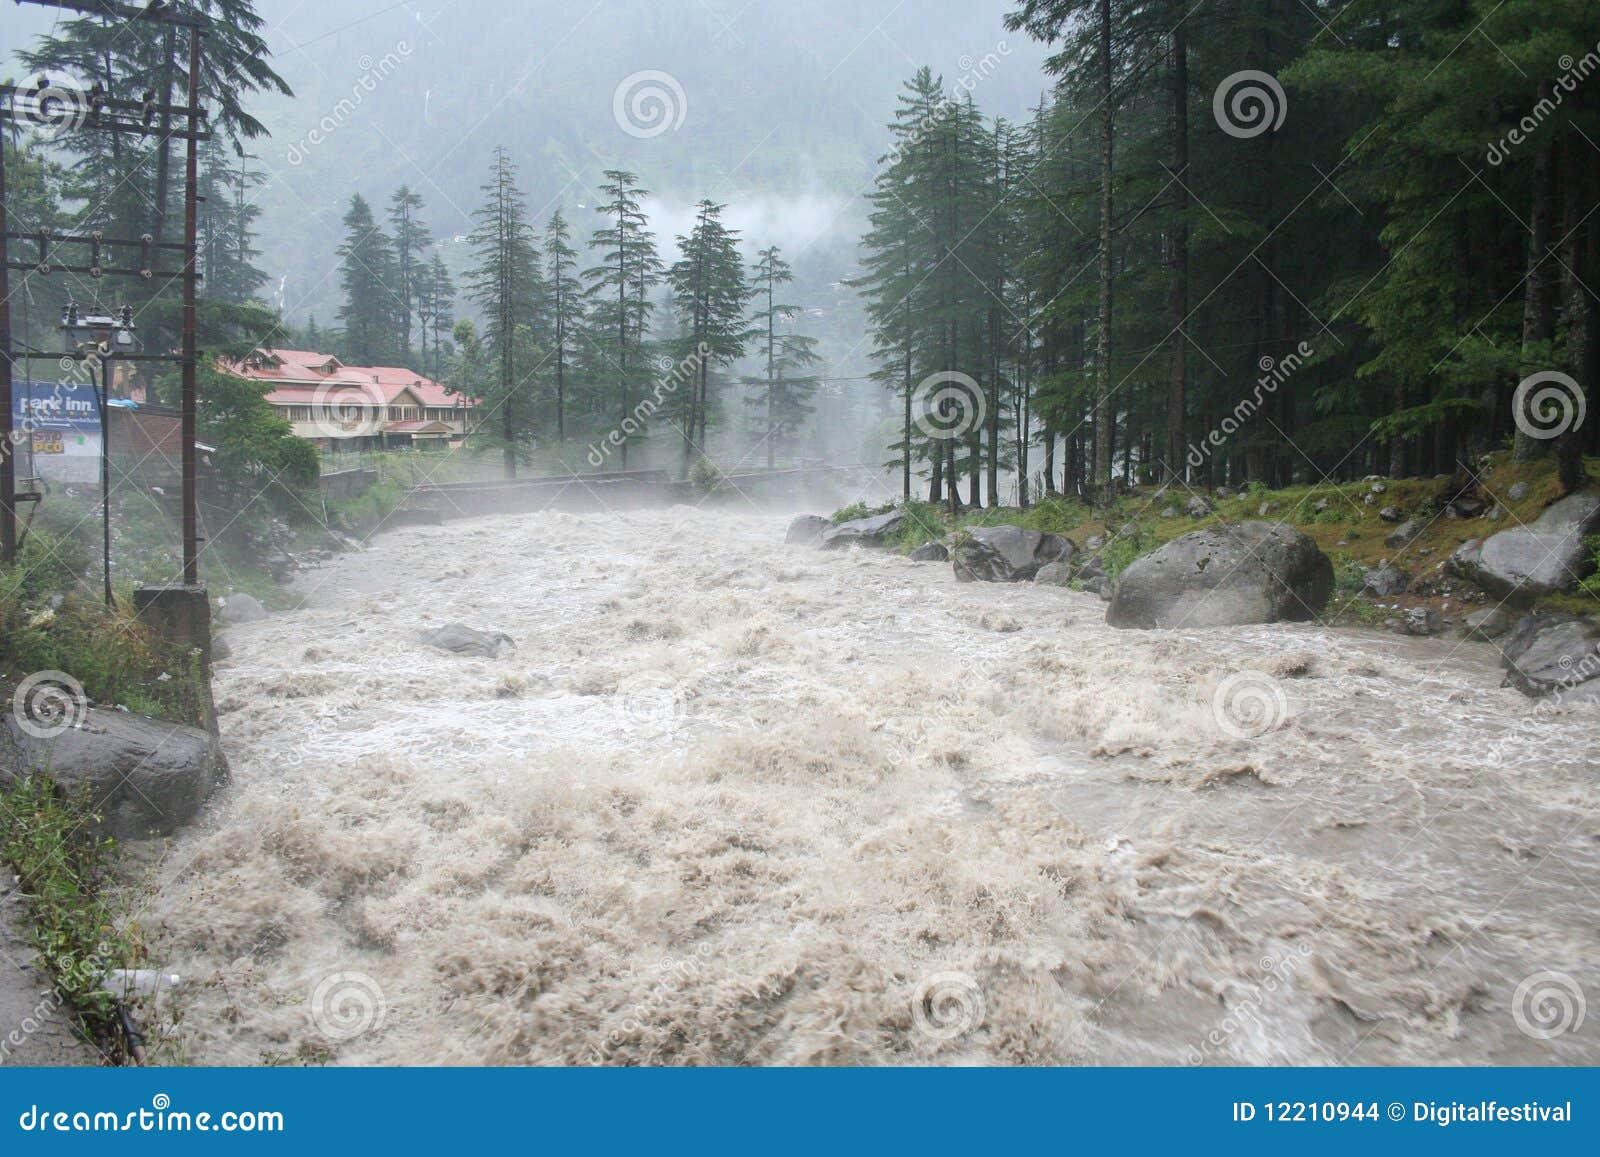 wild raging himalayan river torrent manali india stock photo image rh dreamstime com Clip Art Nothing Clamor Clip Art